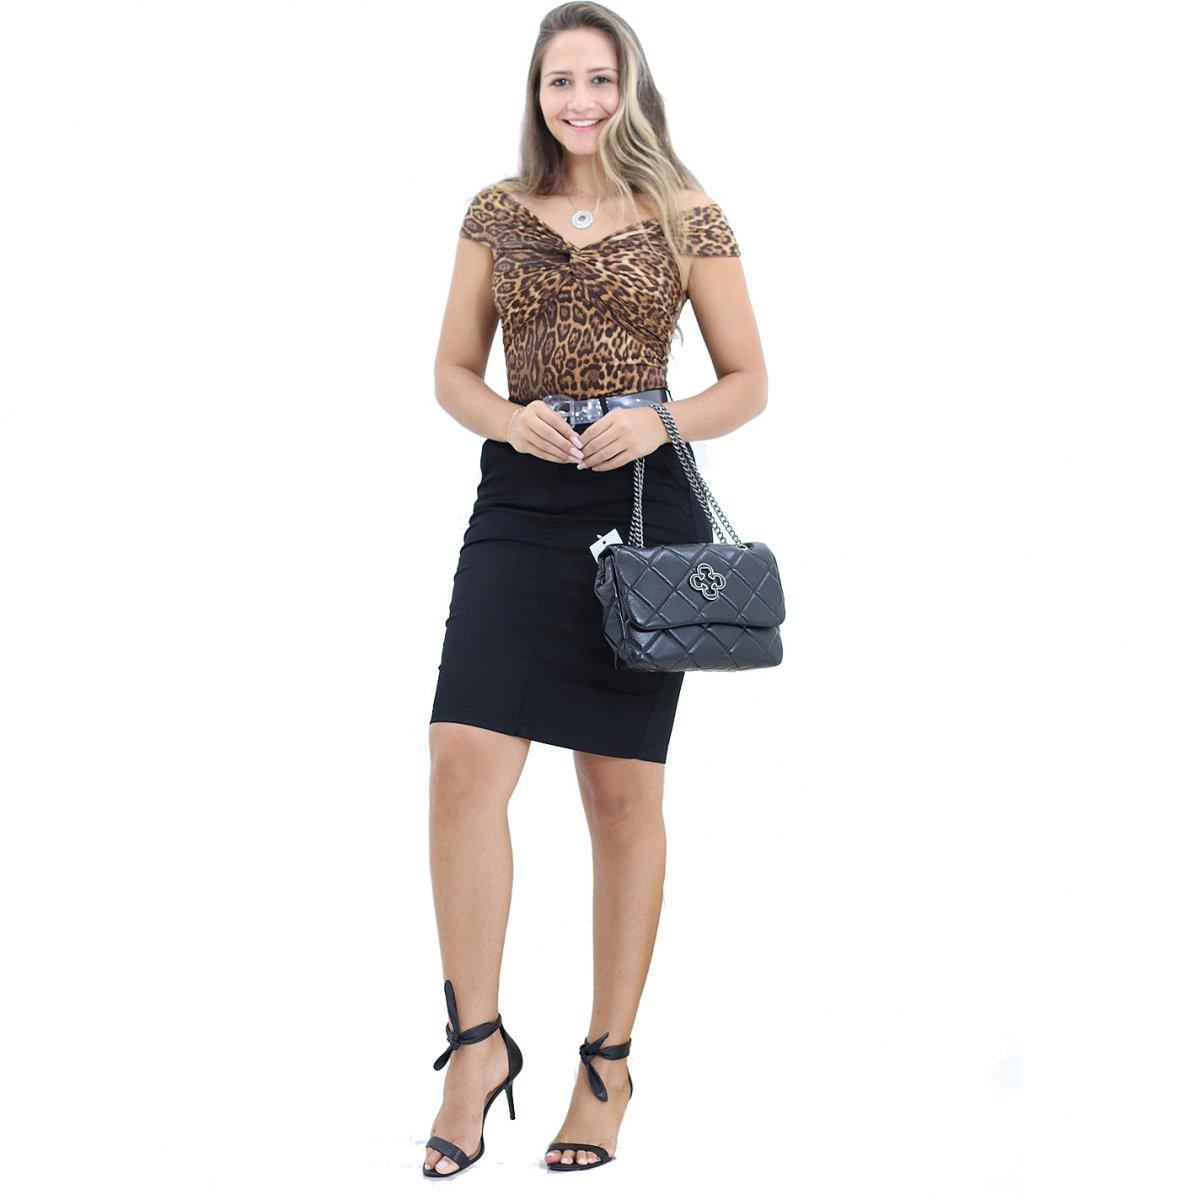 7998160394 Saia Preta Jeans Secretaria Moda Evangélica Preto - MM Concept